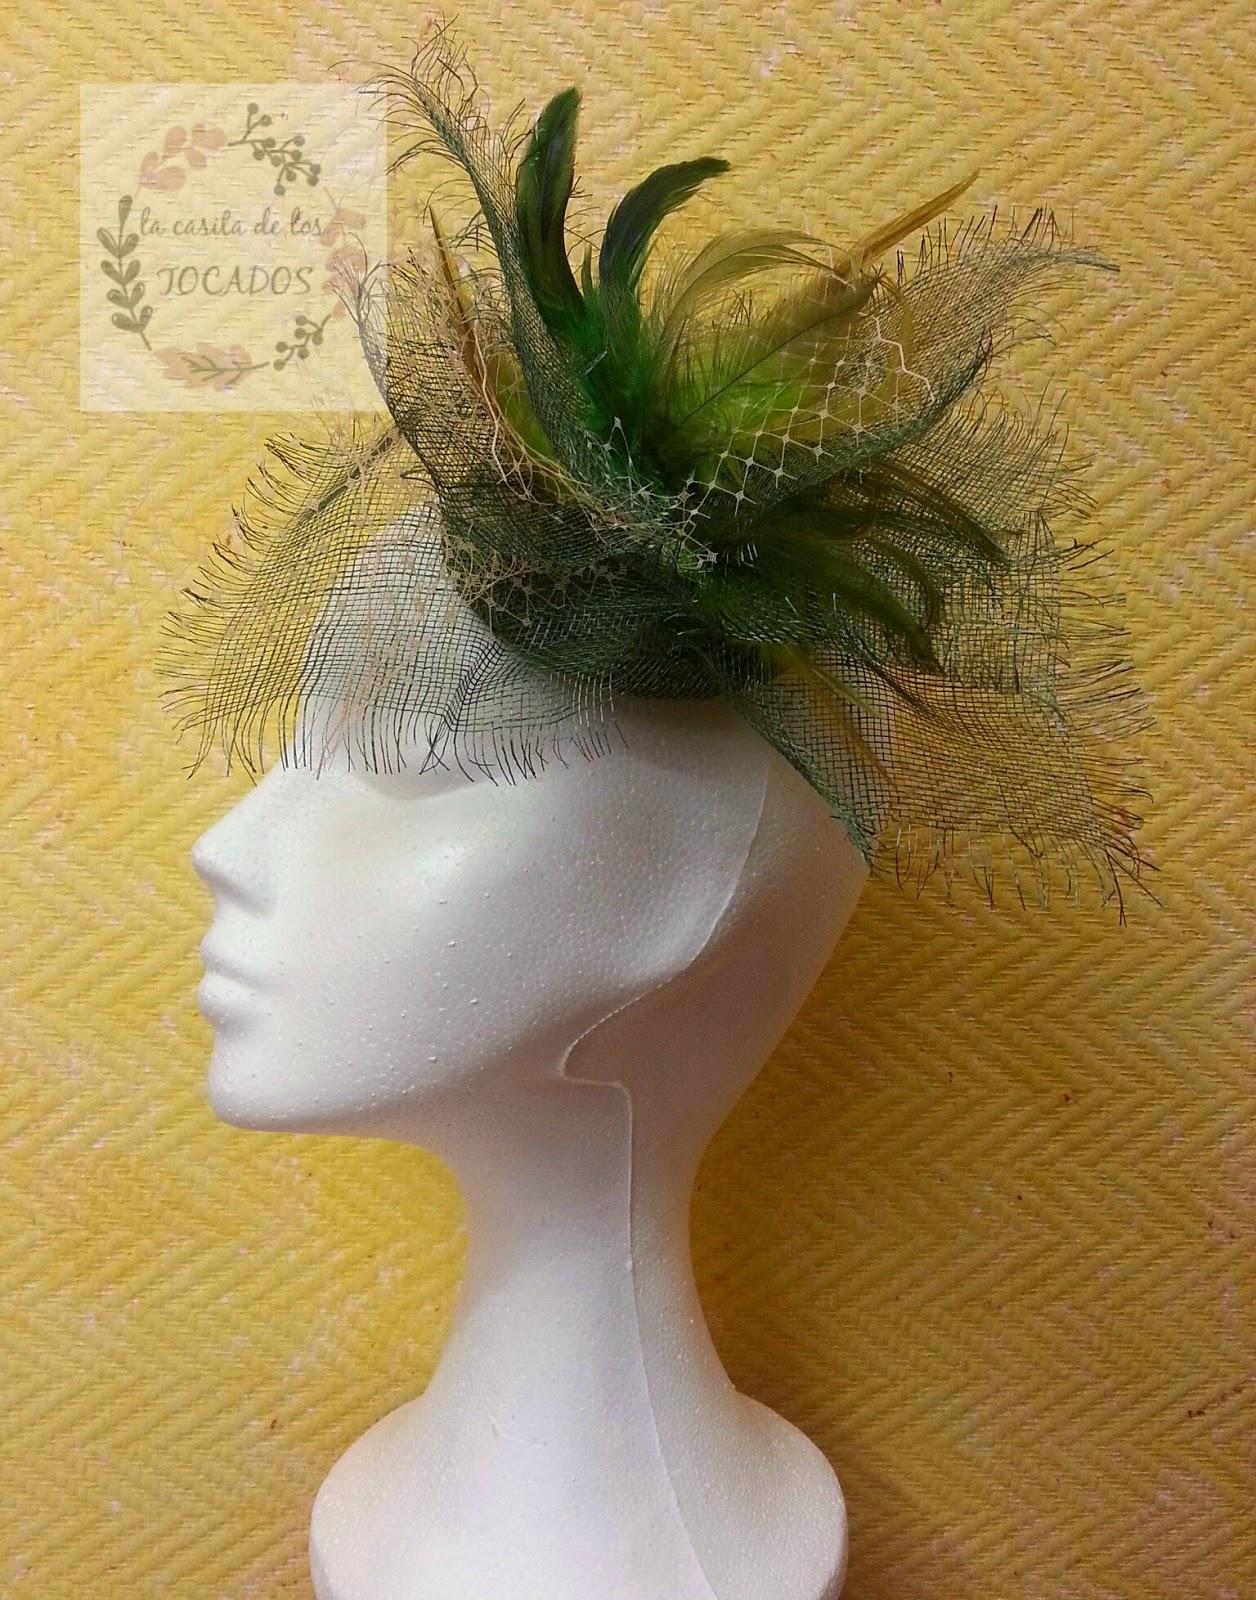 tocado moderno para boda o evento de fiesta en color verde, con sinamay, velo y plumas